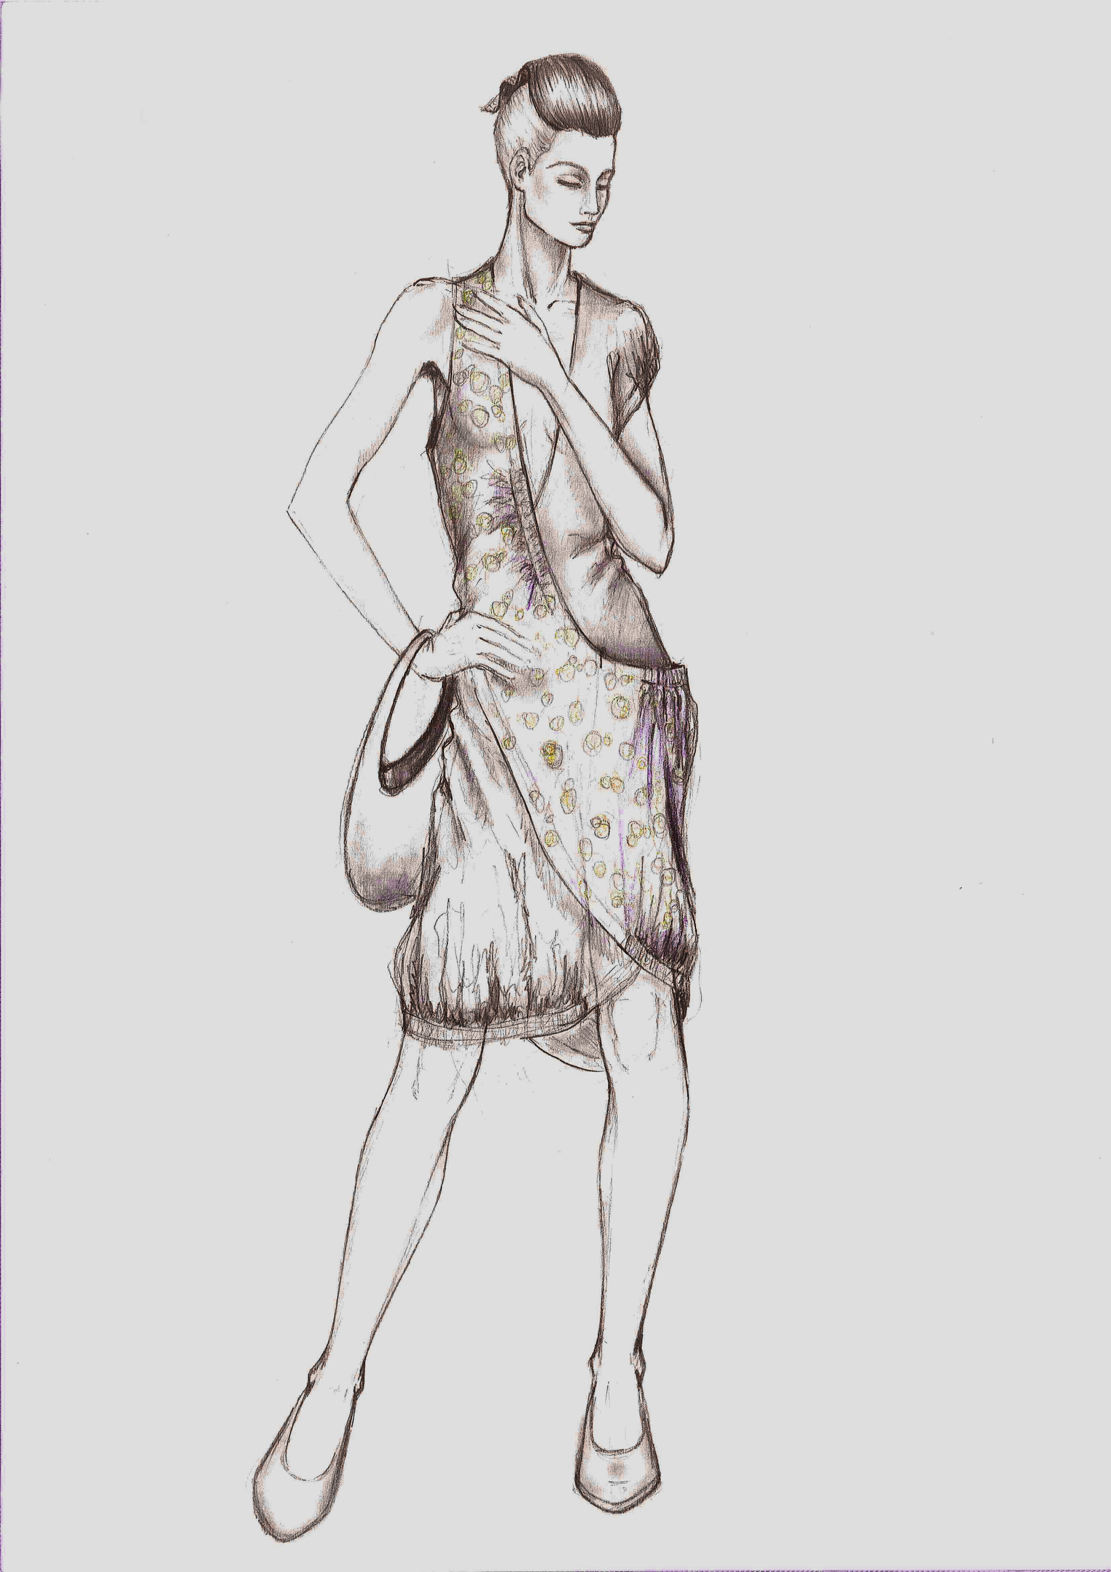 Dibujos de dise o de moda imagui for Dibujos de disenos de moda